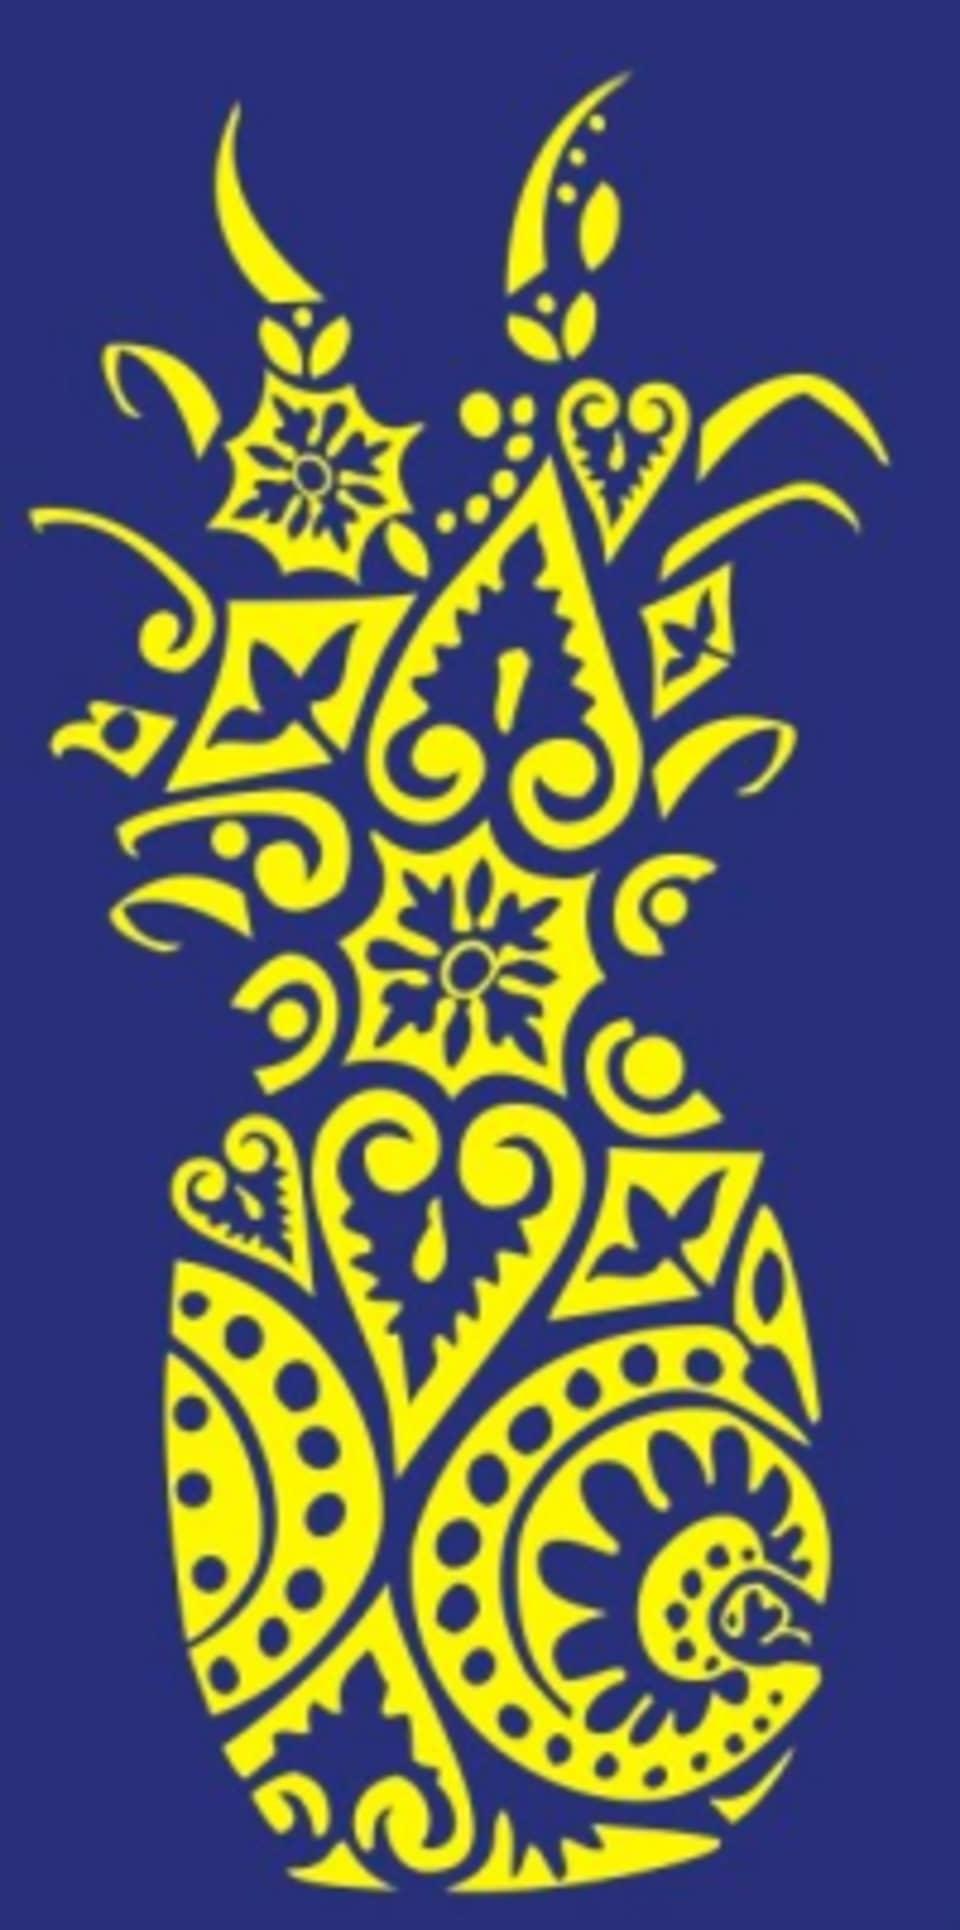 Pineapple Dance Studios  logo